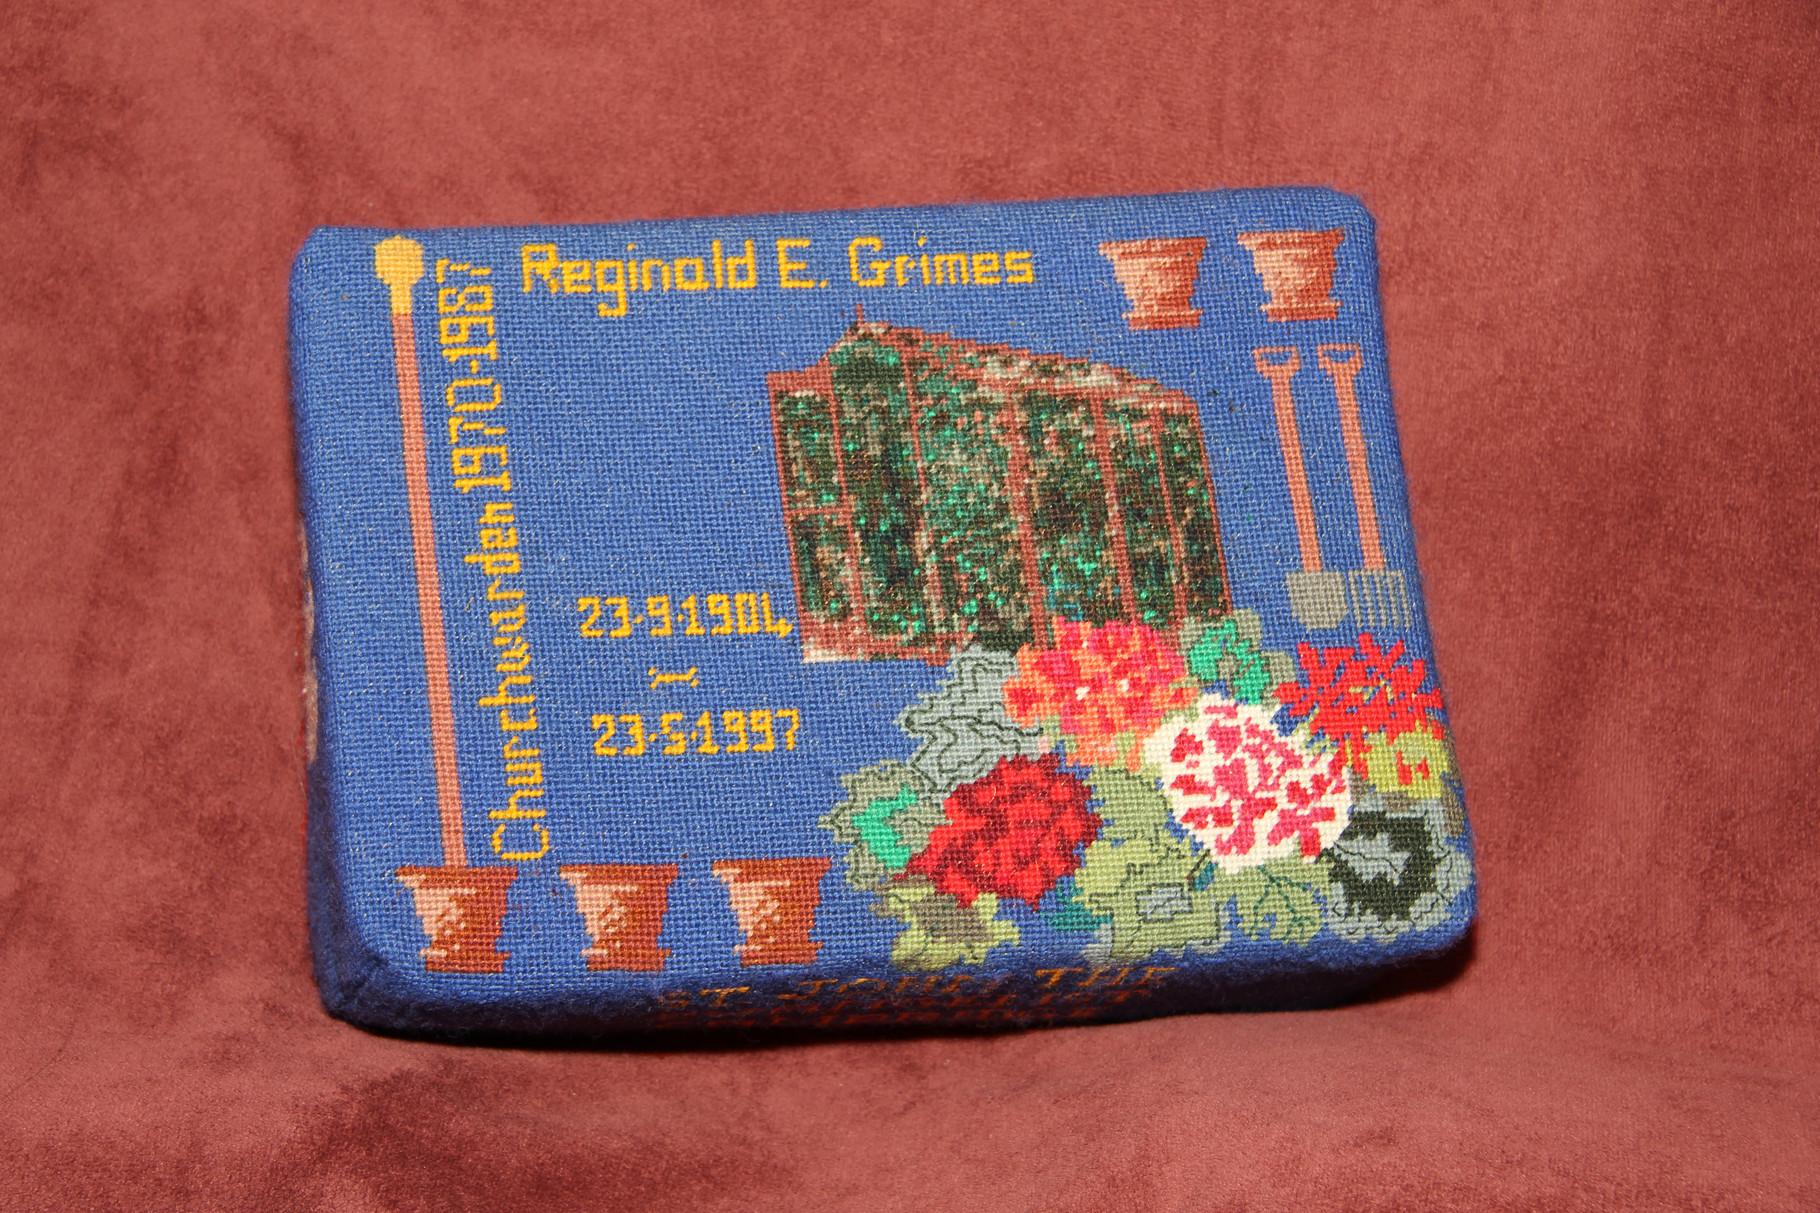 38.  Garden Design in memory of Reg Grimes (Churchwarden) (1904-1997) – worked by Bridget Garton and Rachel Gray